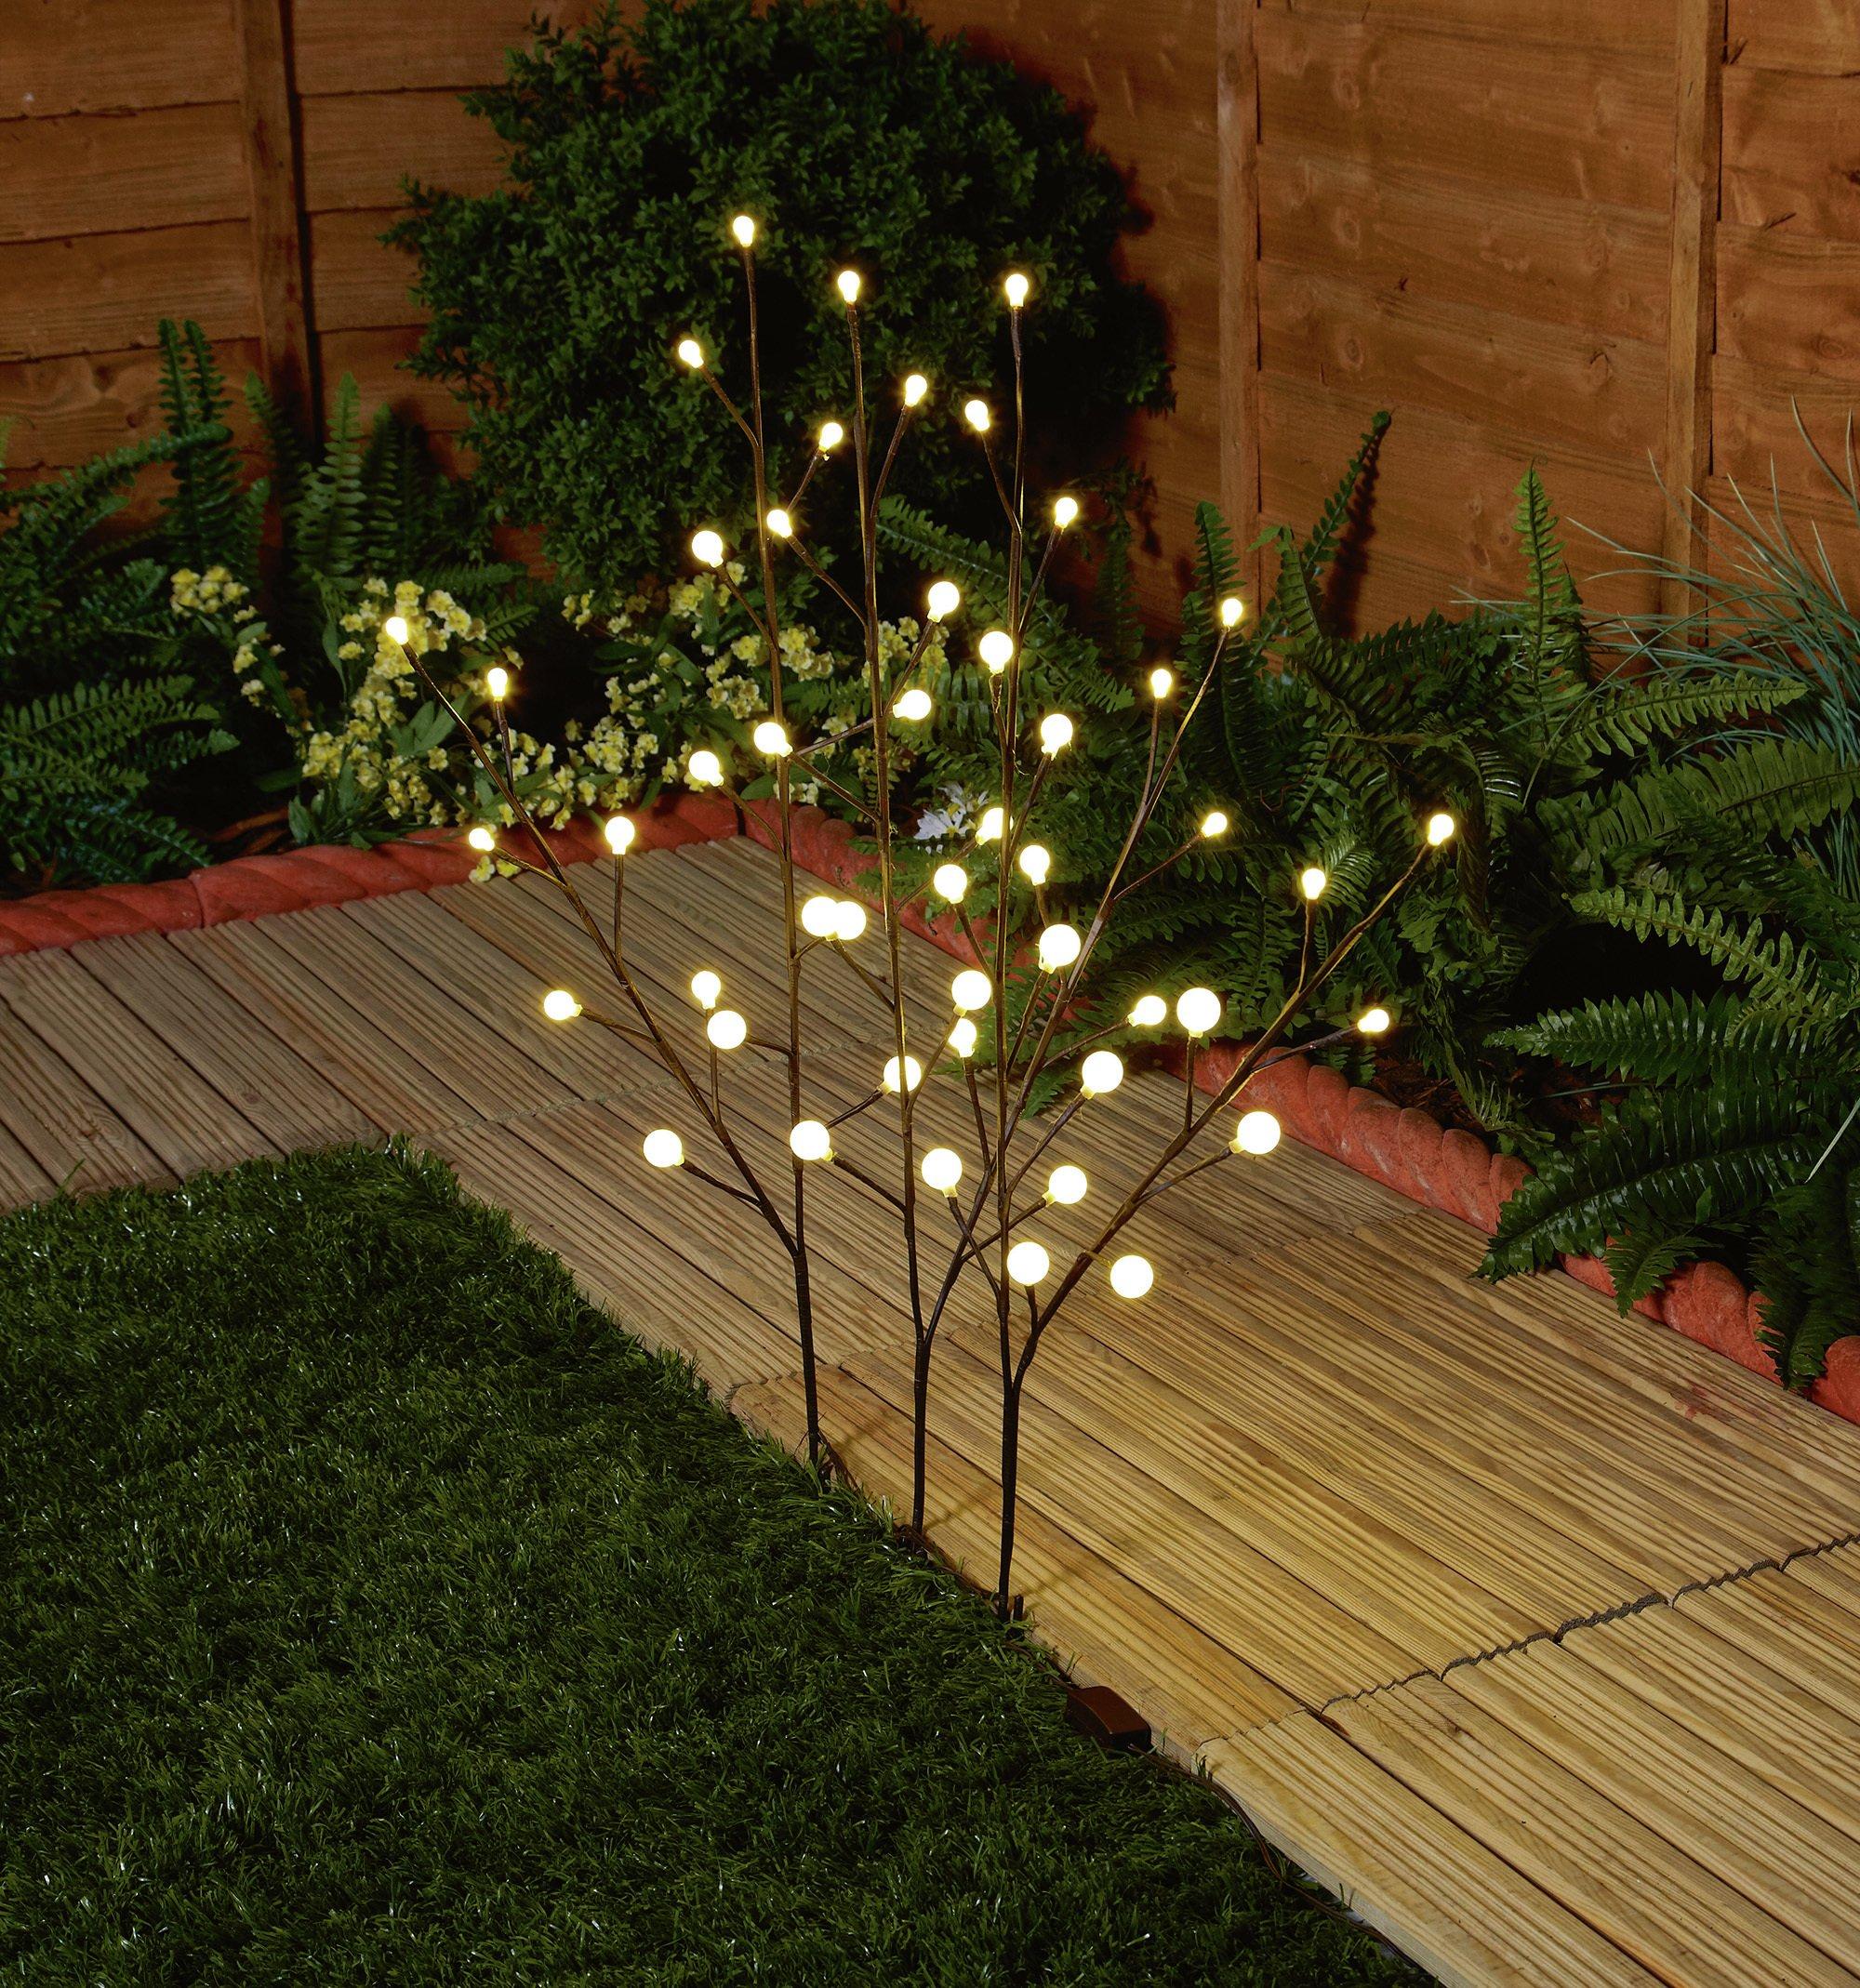 Premier - Decorations - Twig Branch LED Lights - Warm White